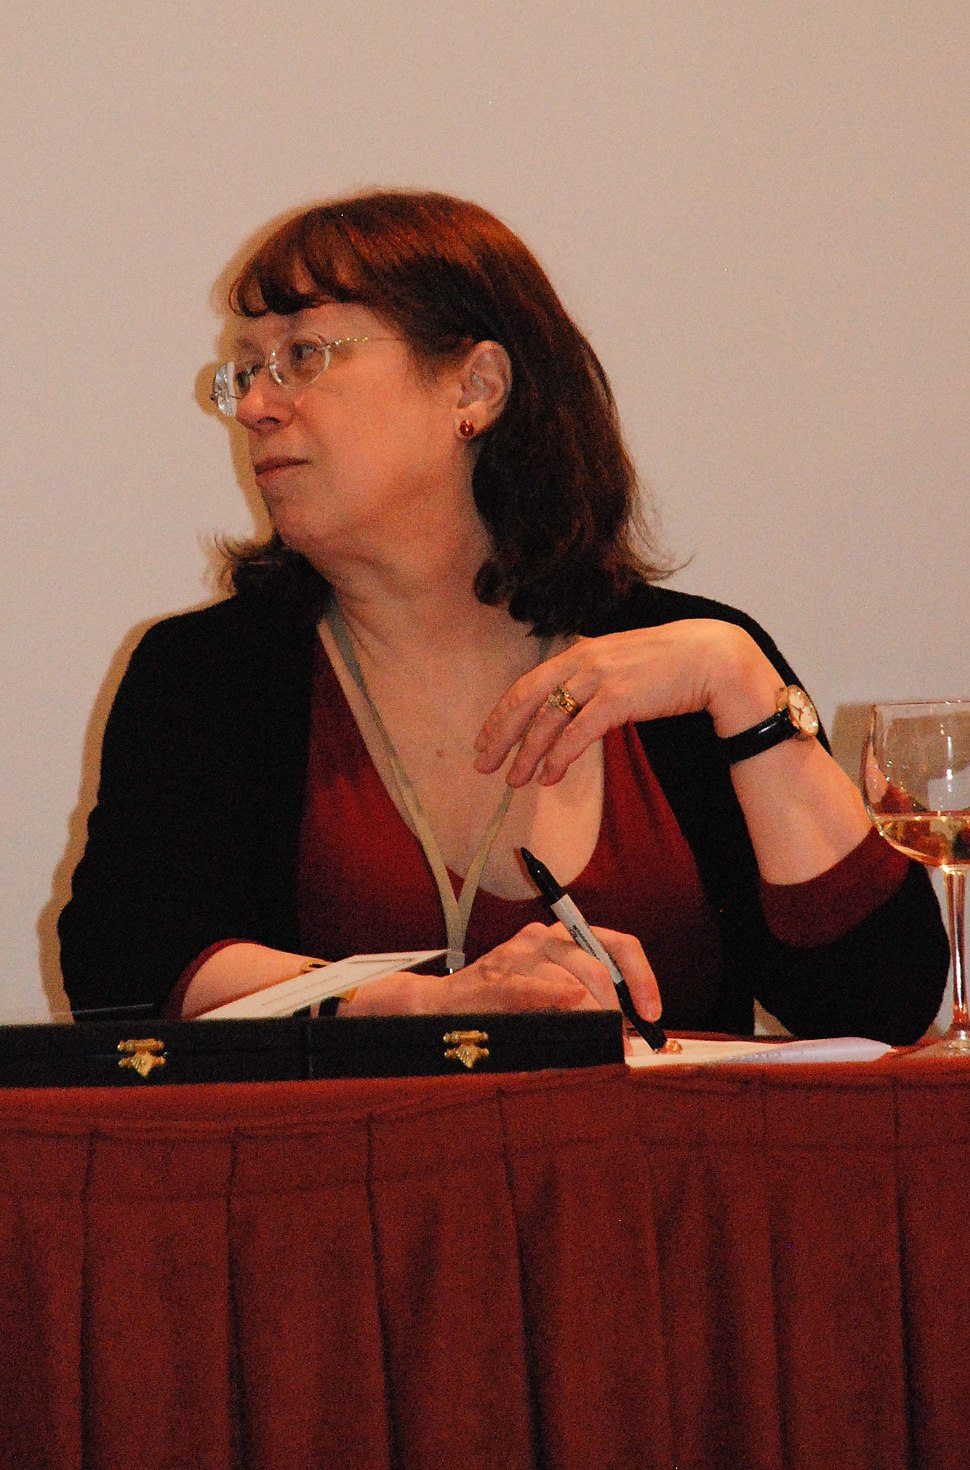 Diane Duane, Deepcon 11, 2010